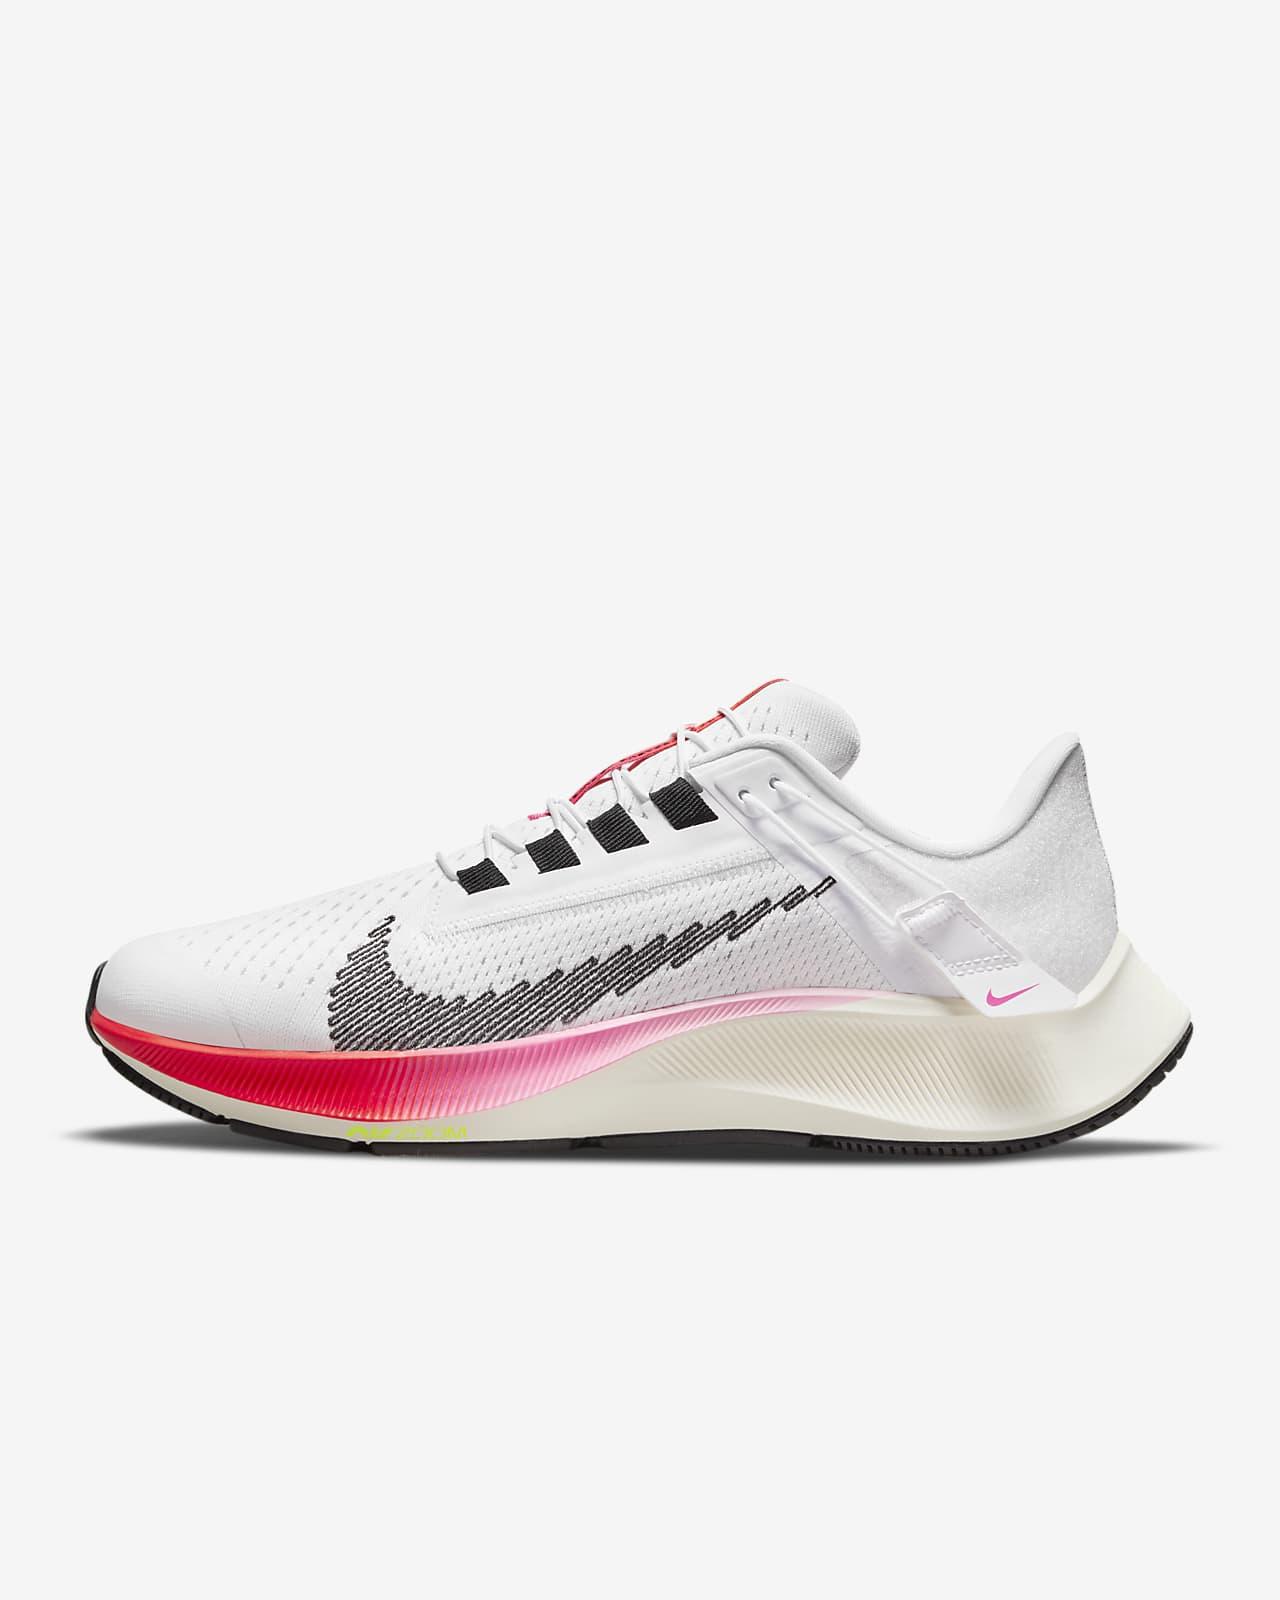 Nike Air Zoom Pegasus 38 FlyEase Women's Easy On/Off Road Running Shoe